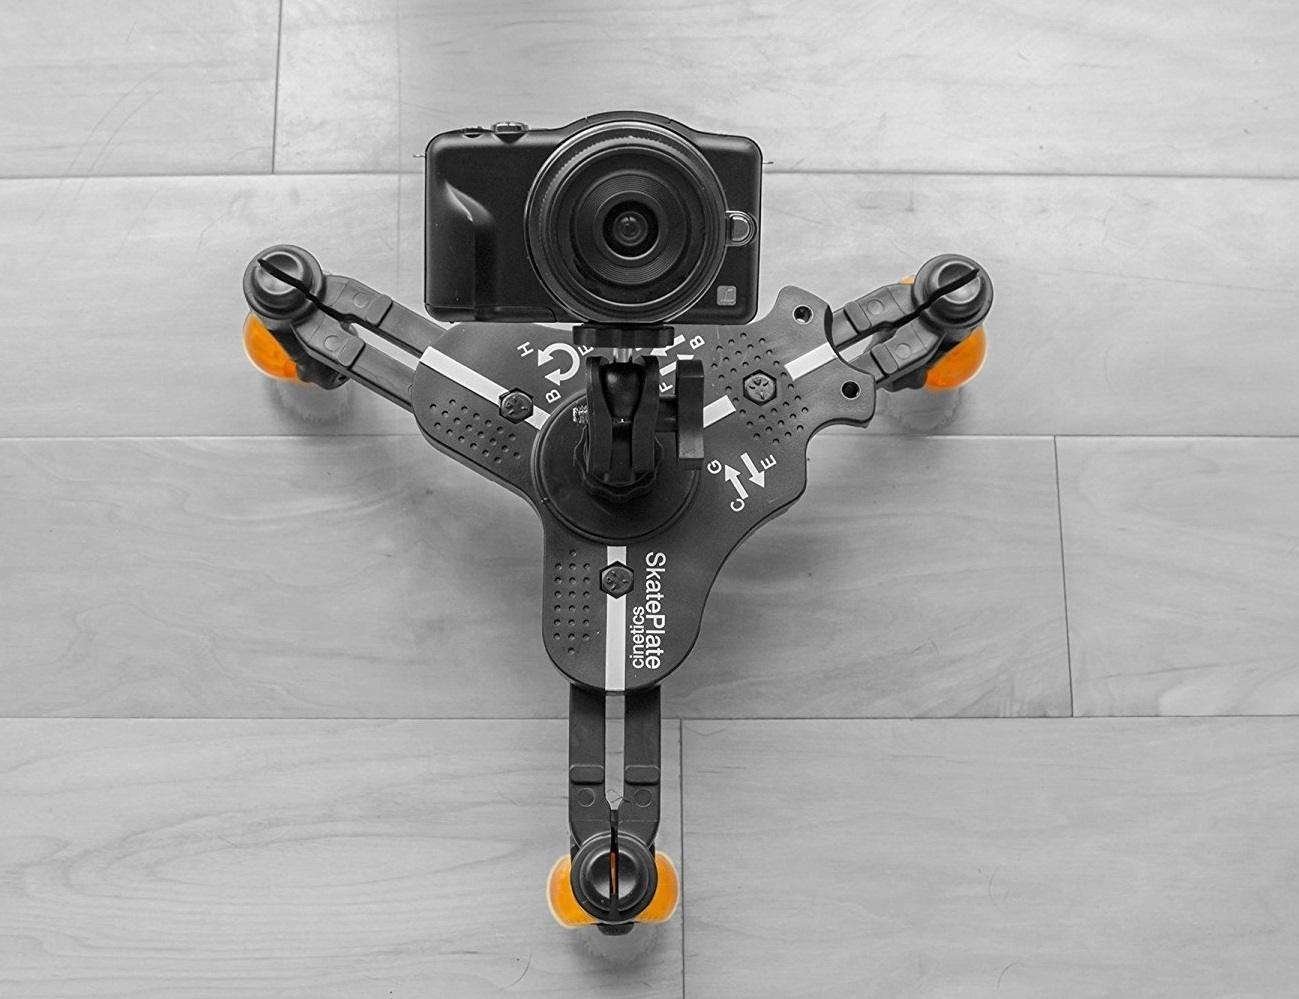 Miniskates – Three Wheels for Fluid Camera Movement